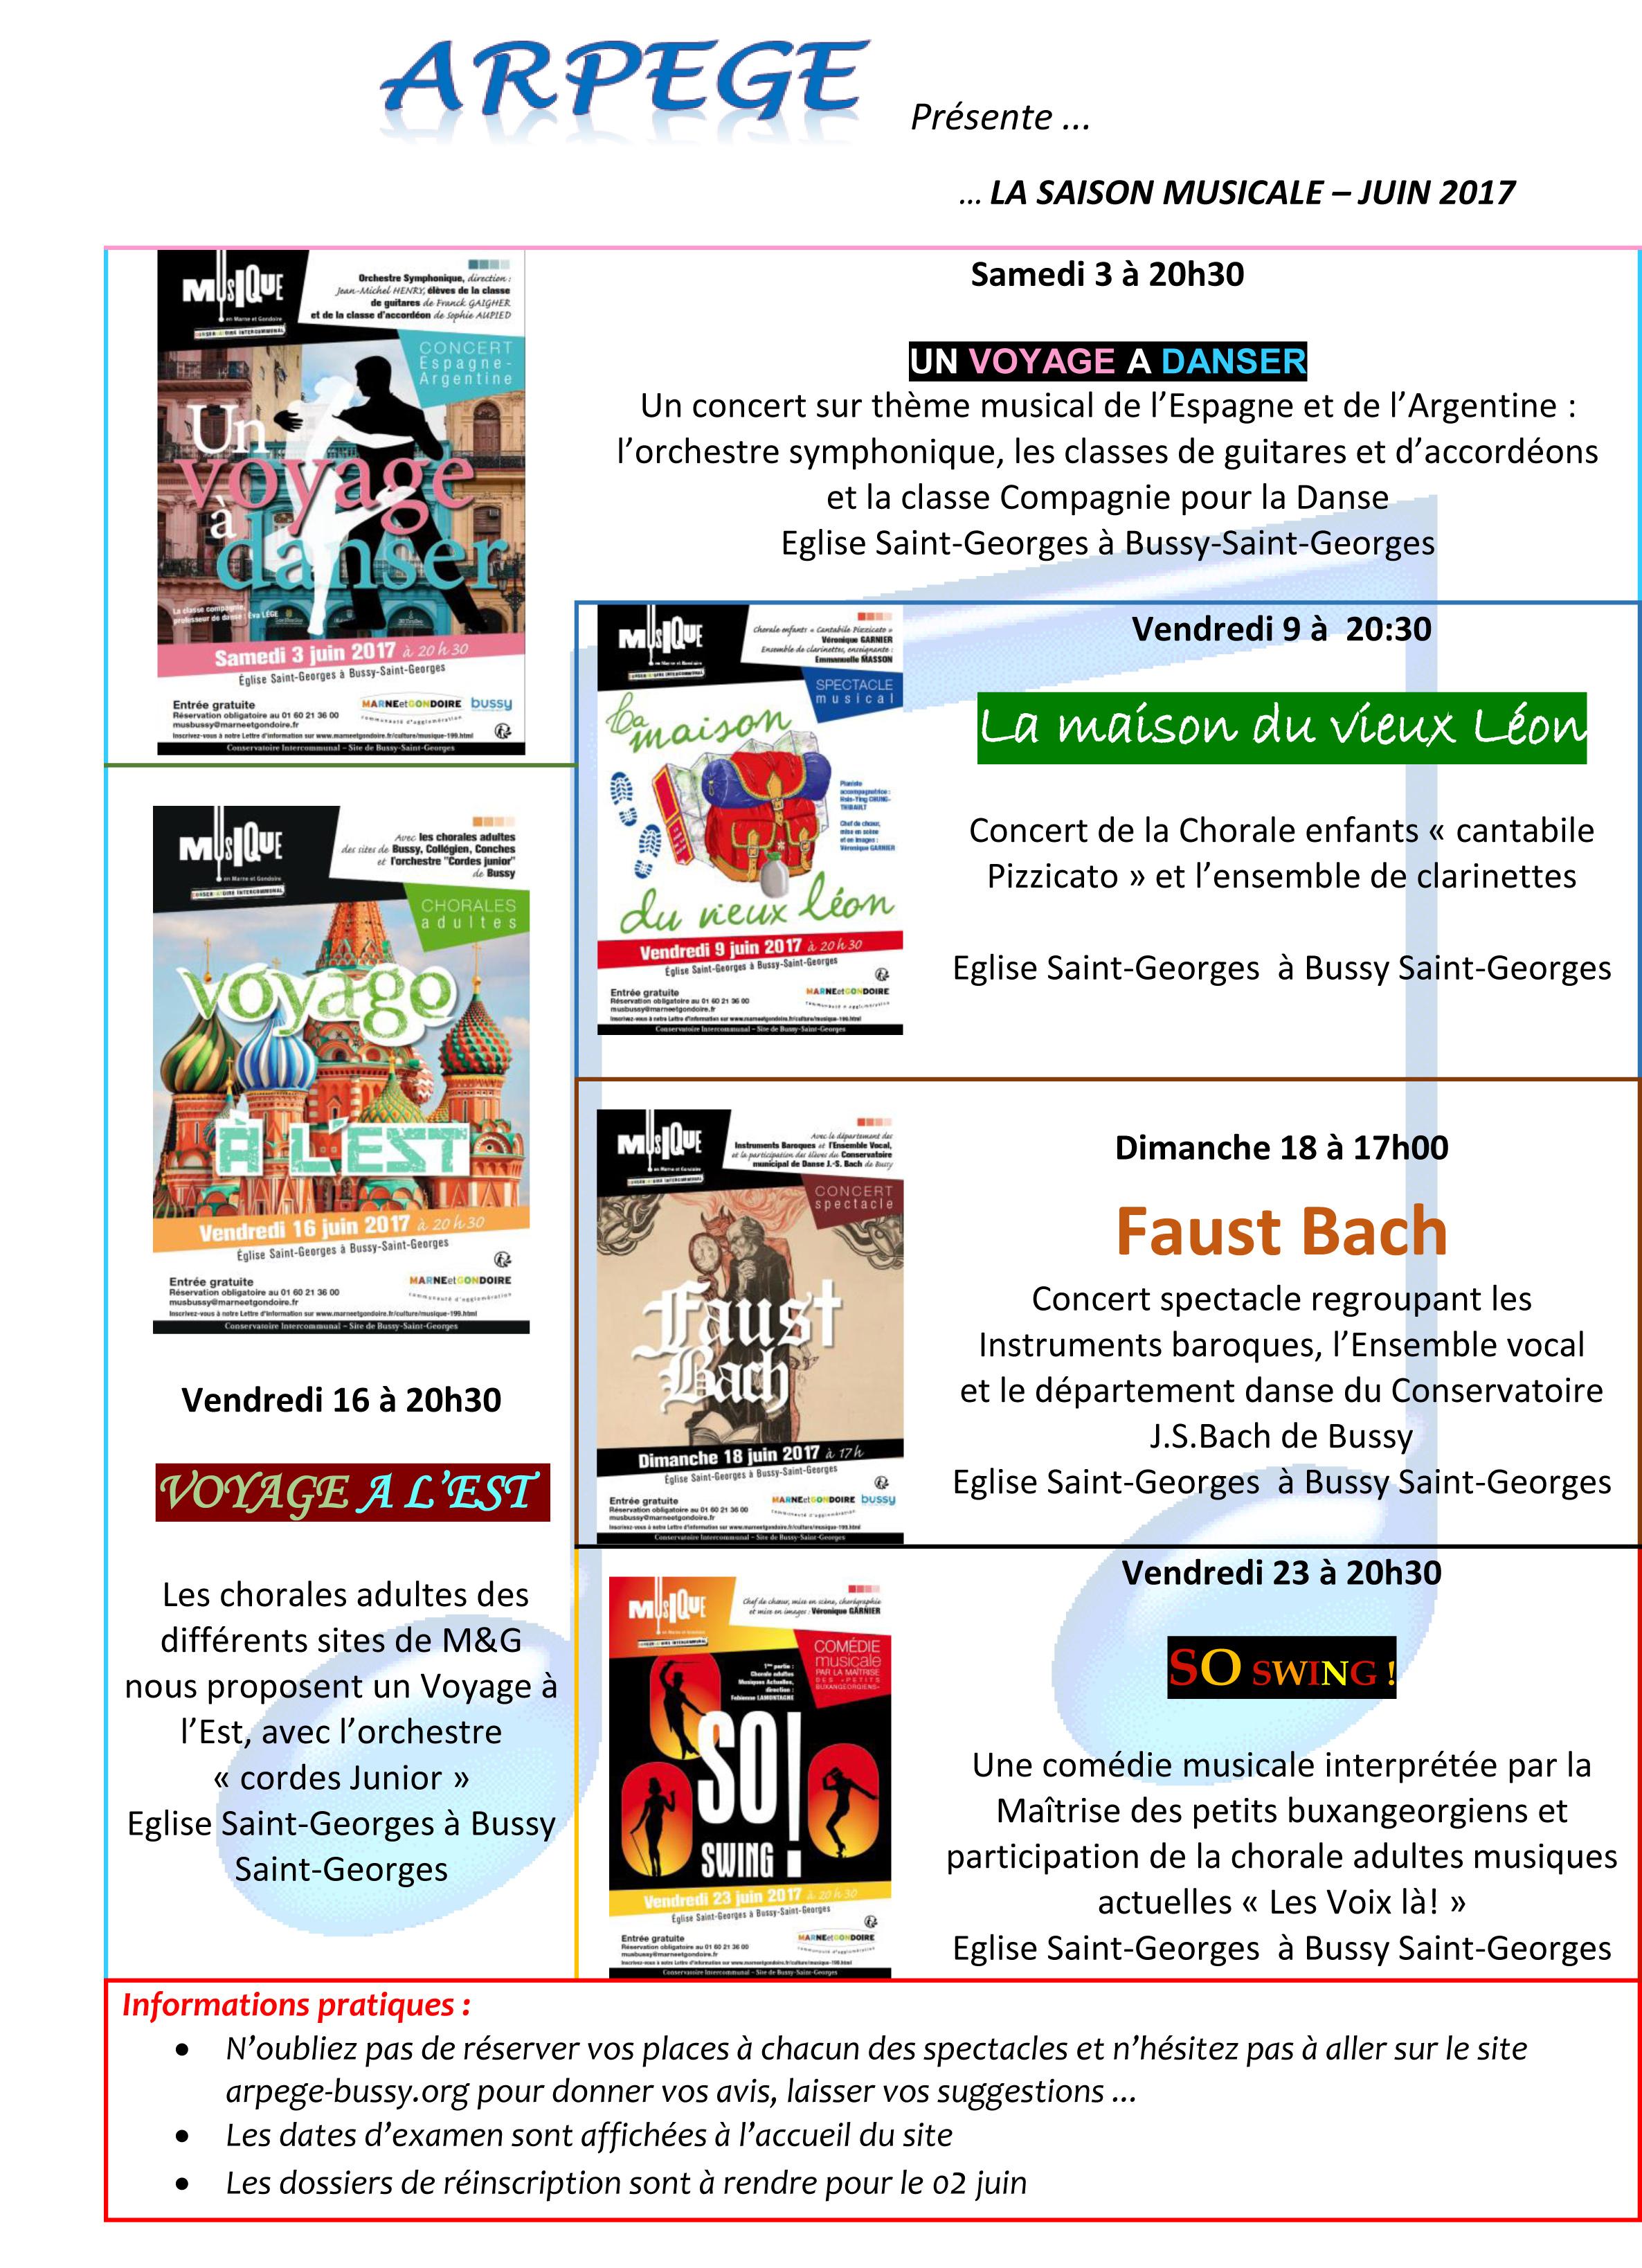 Saison-Musicale-Juin-2017